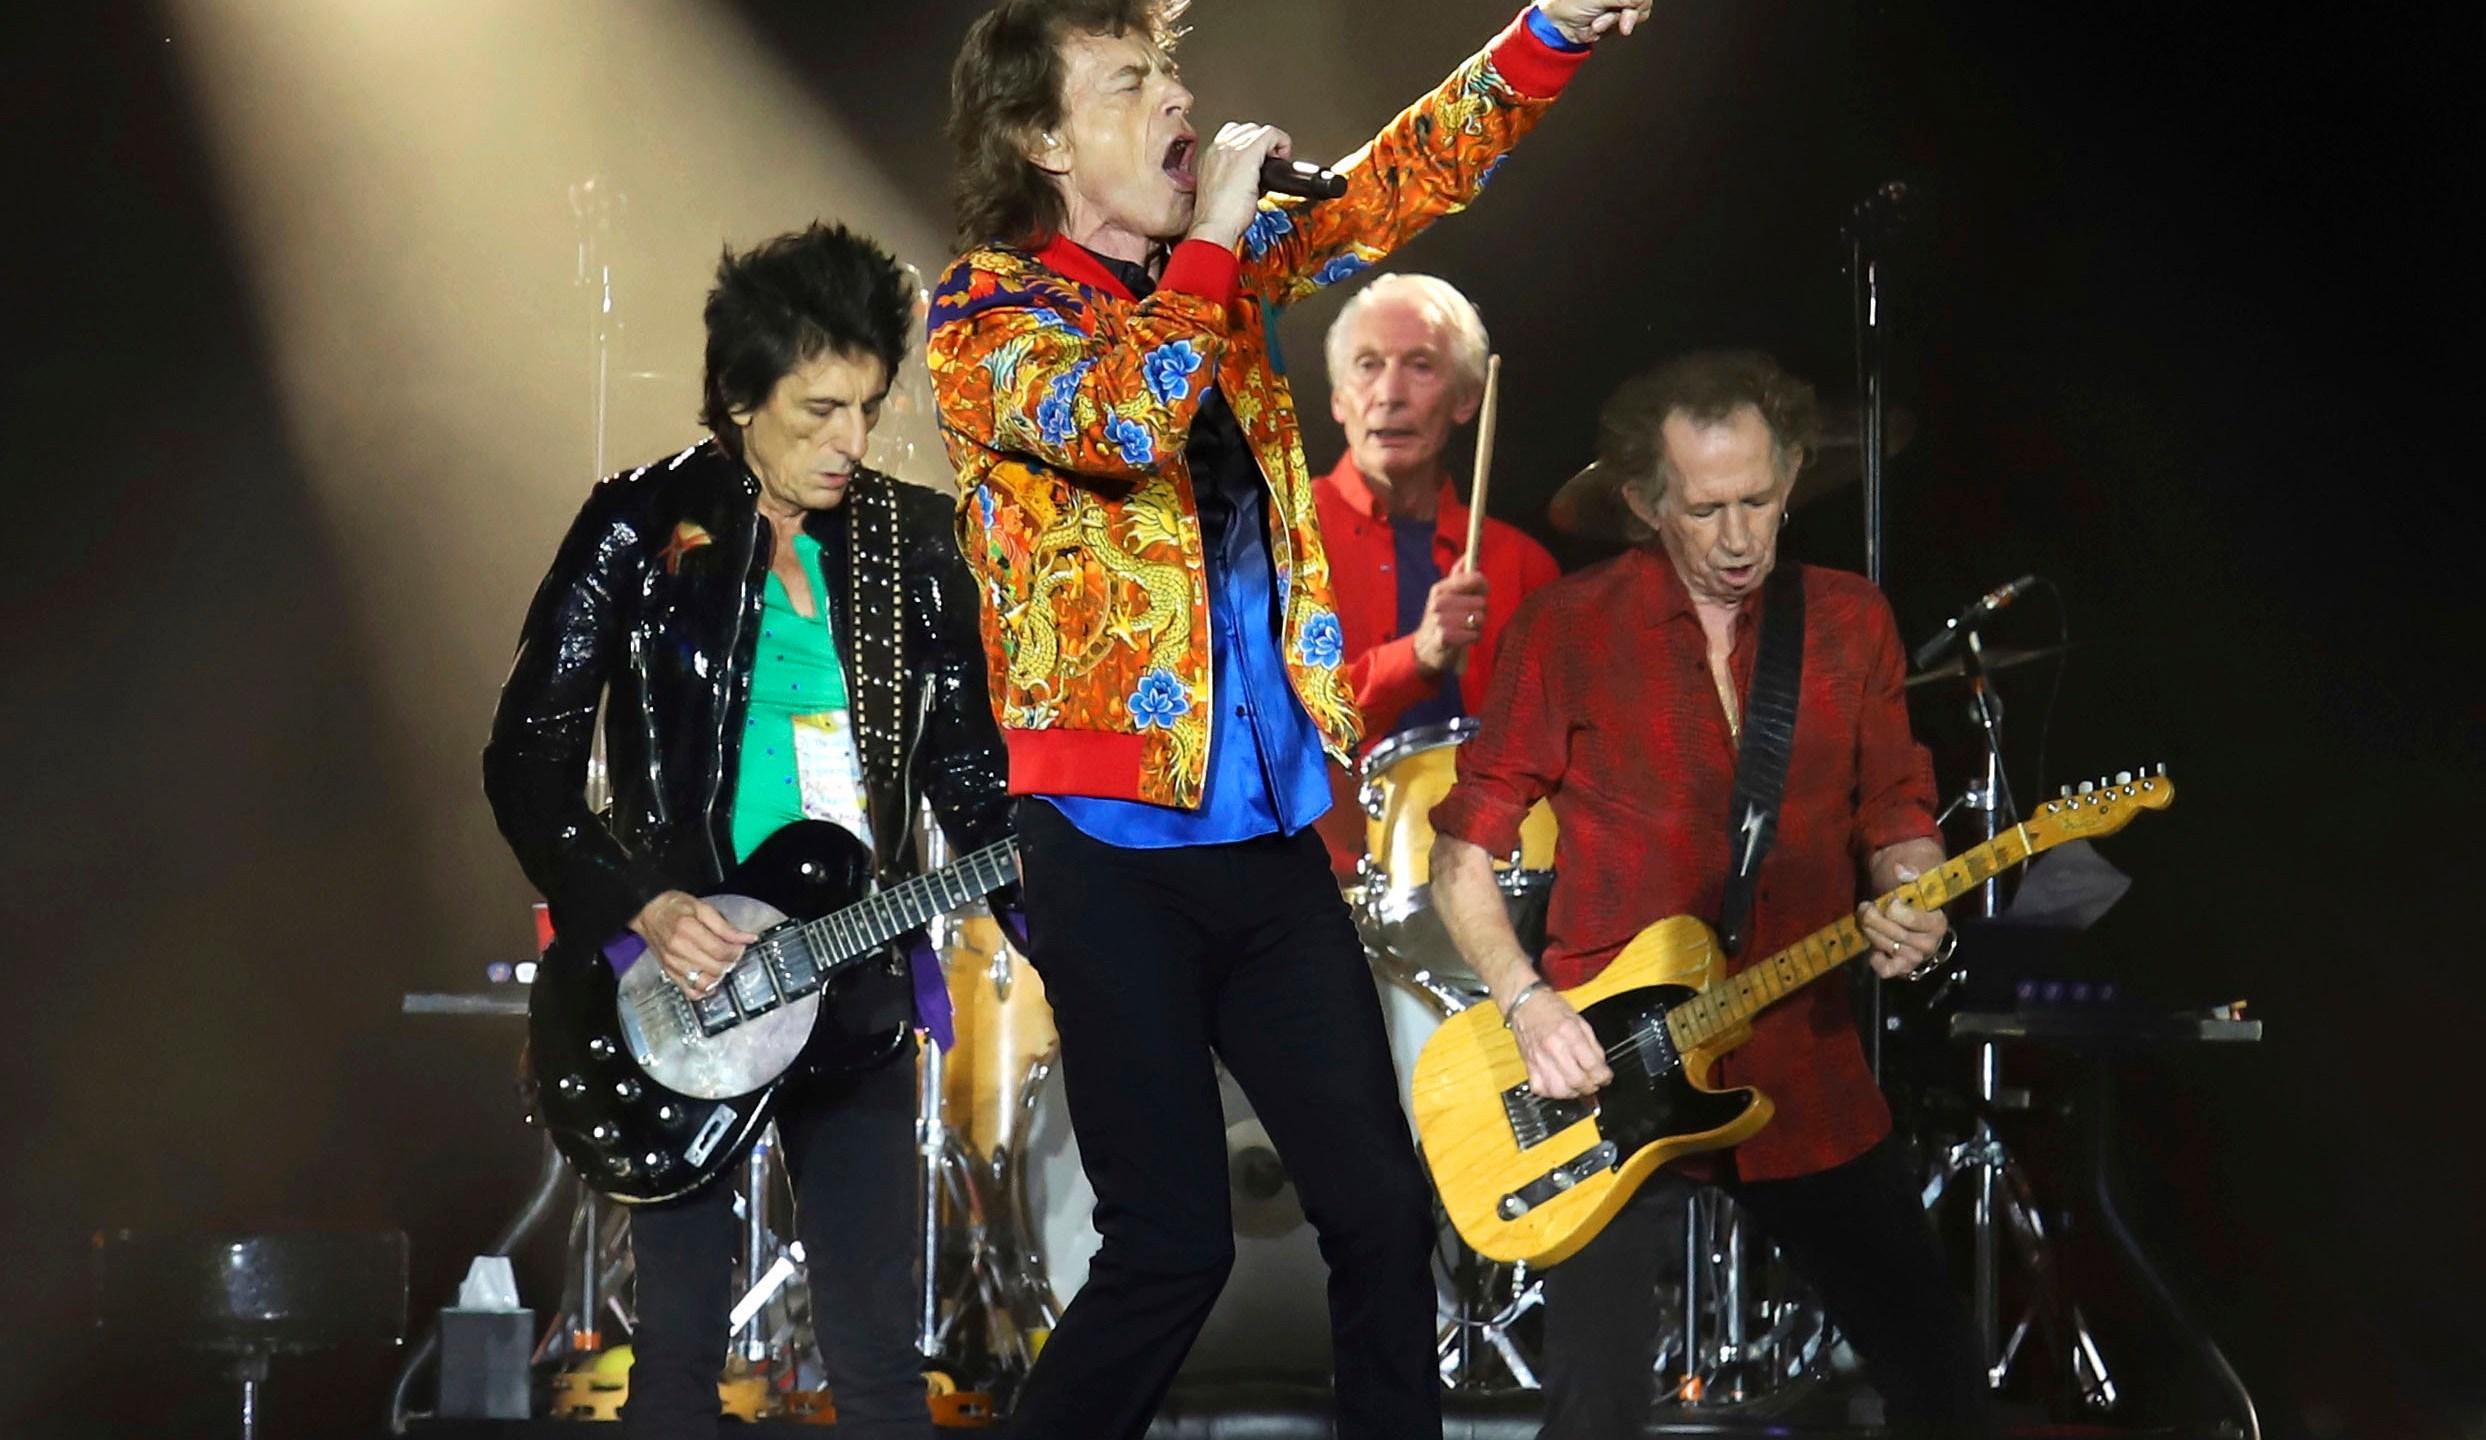 Ronnie Wood, Mick Jagger, Charlie Watts, Keith Richards